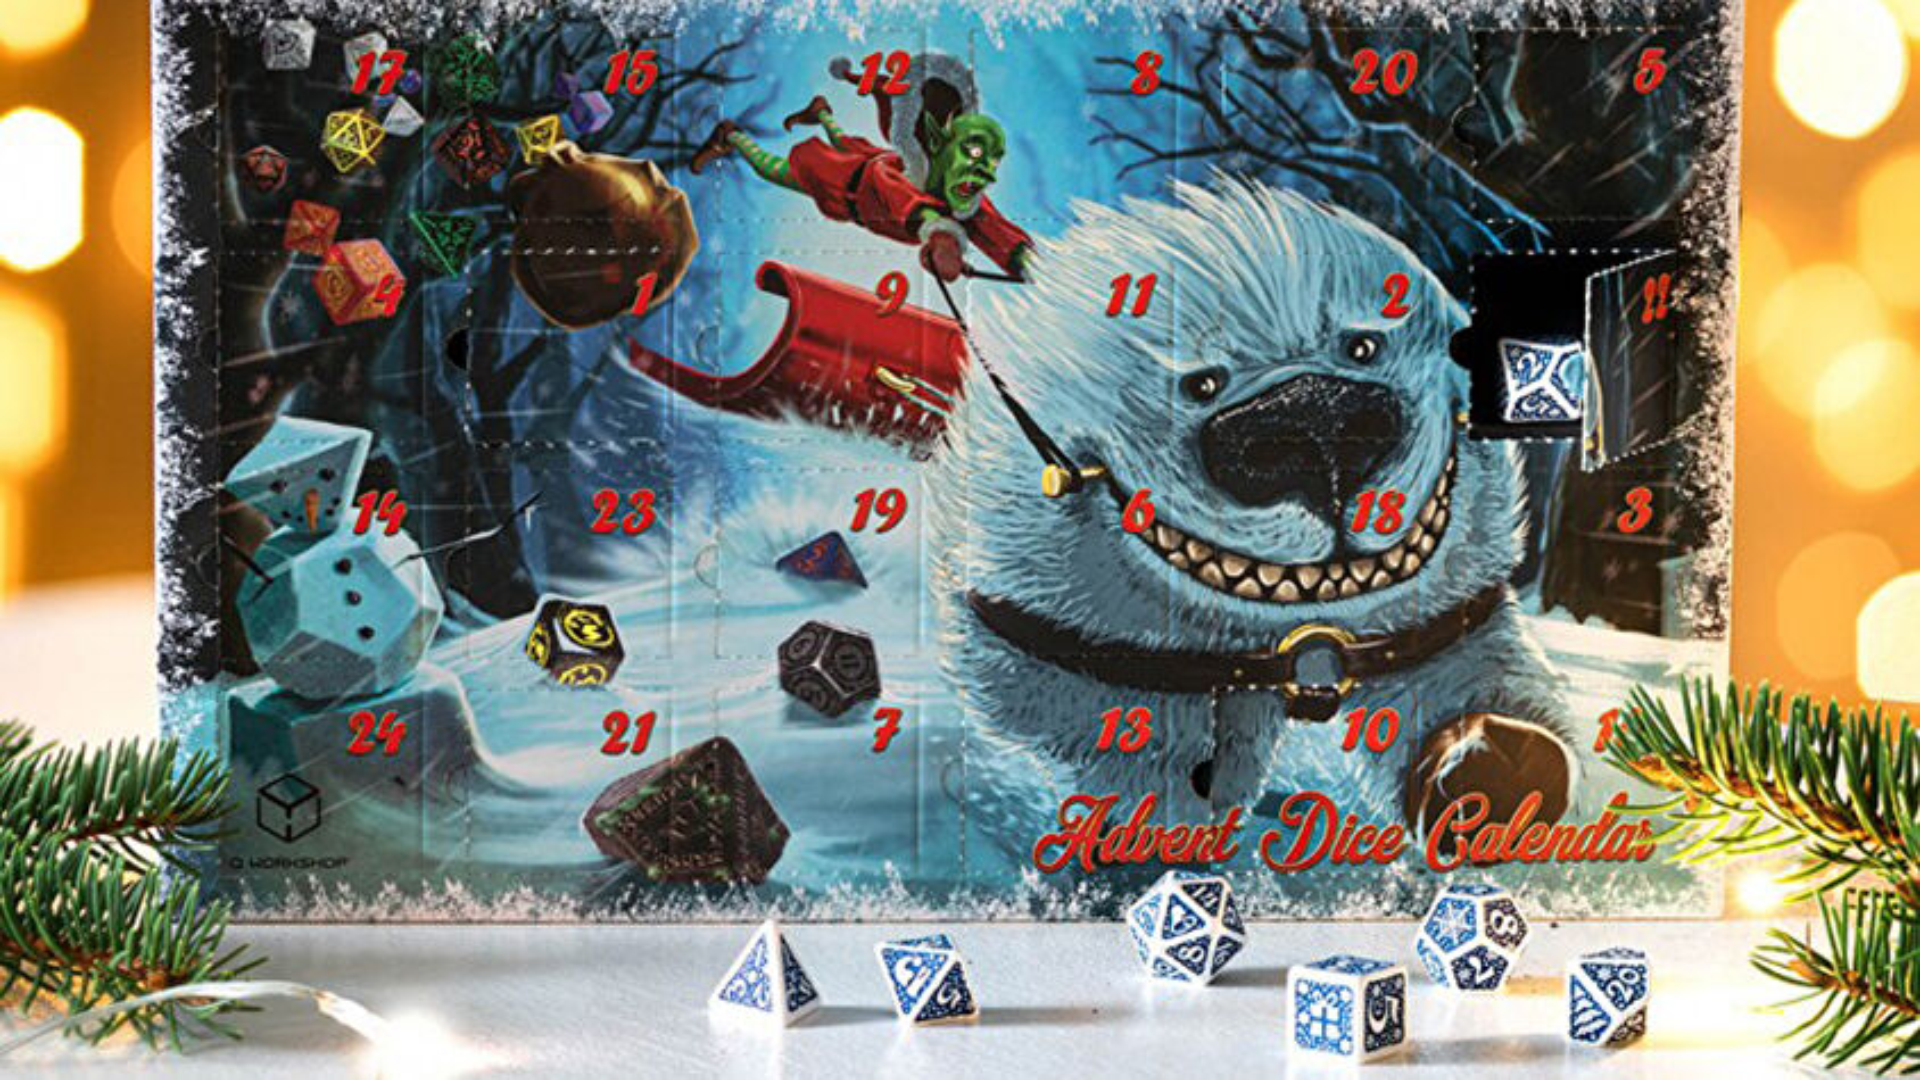 advent-dice-calendar.jpg